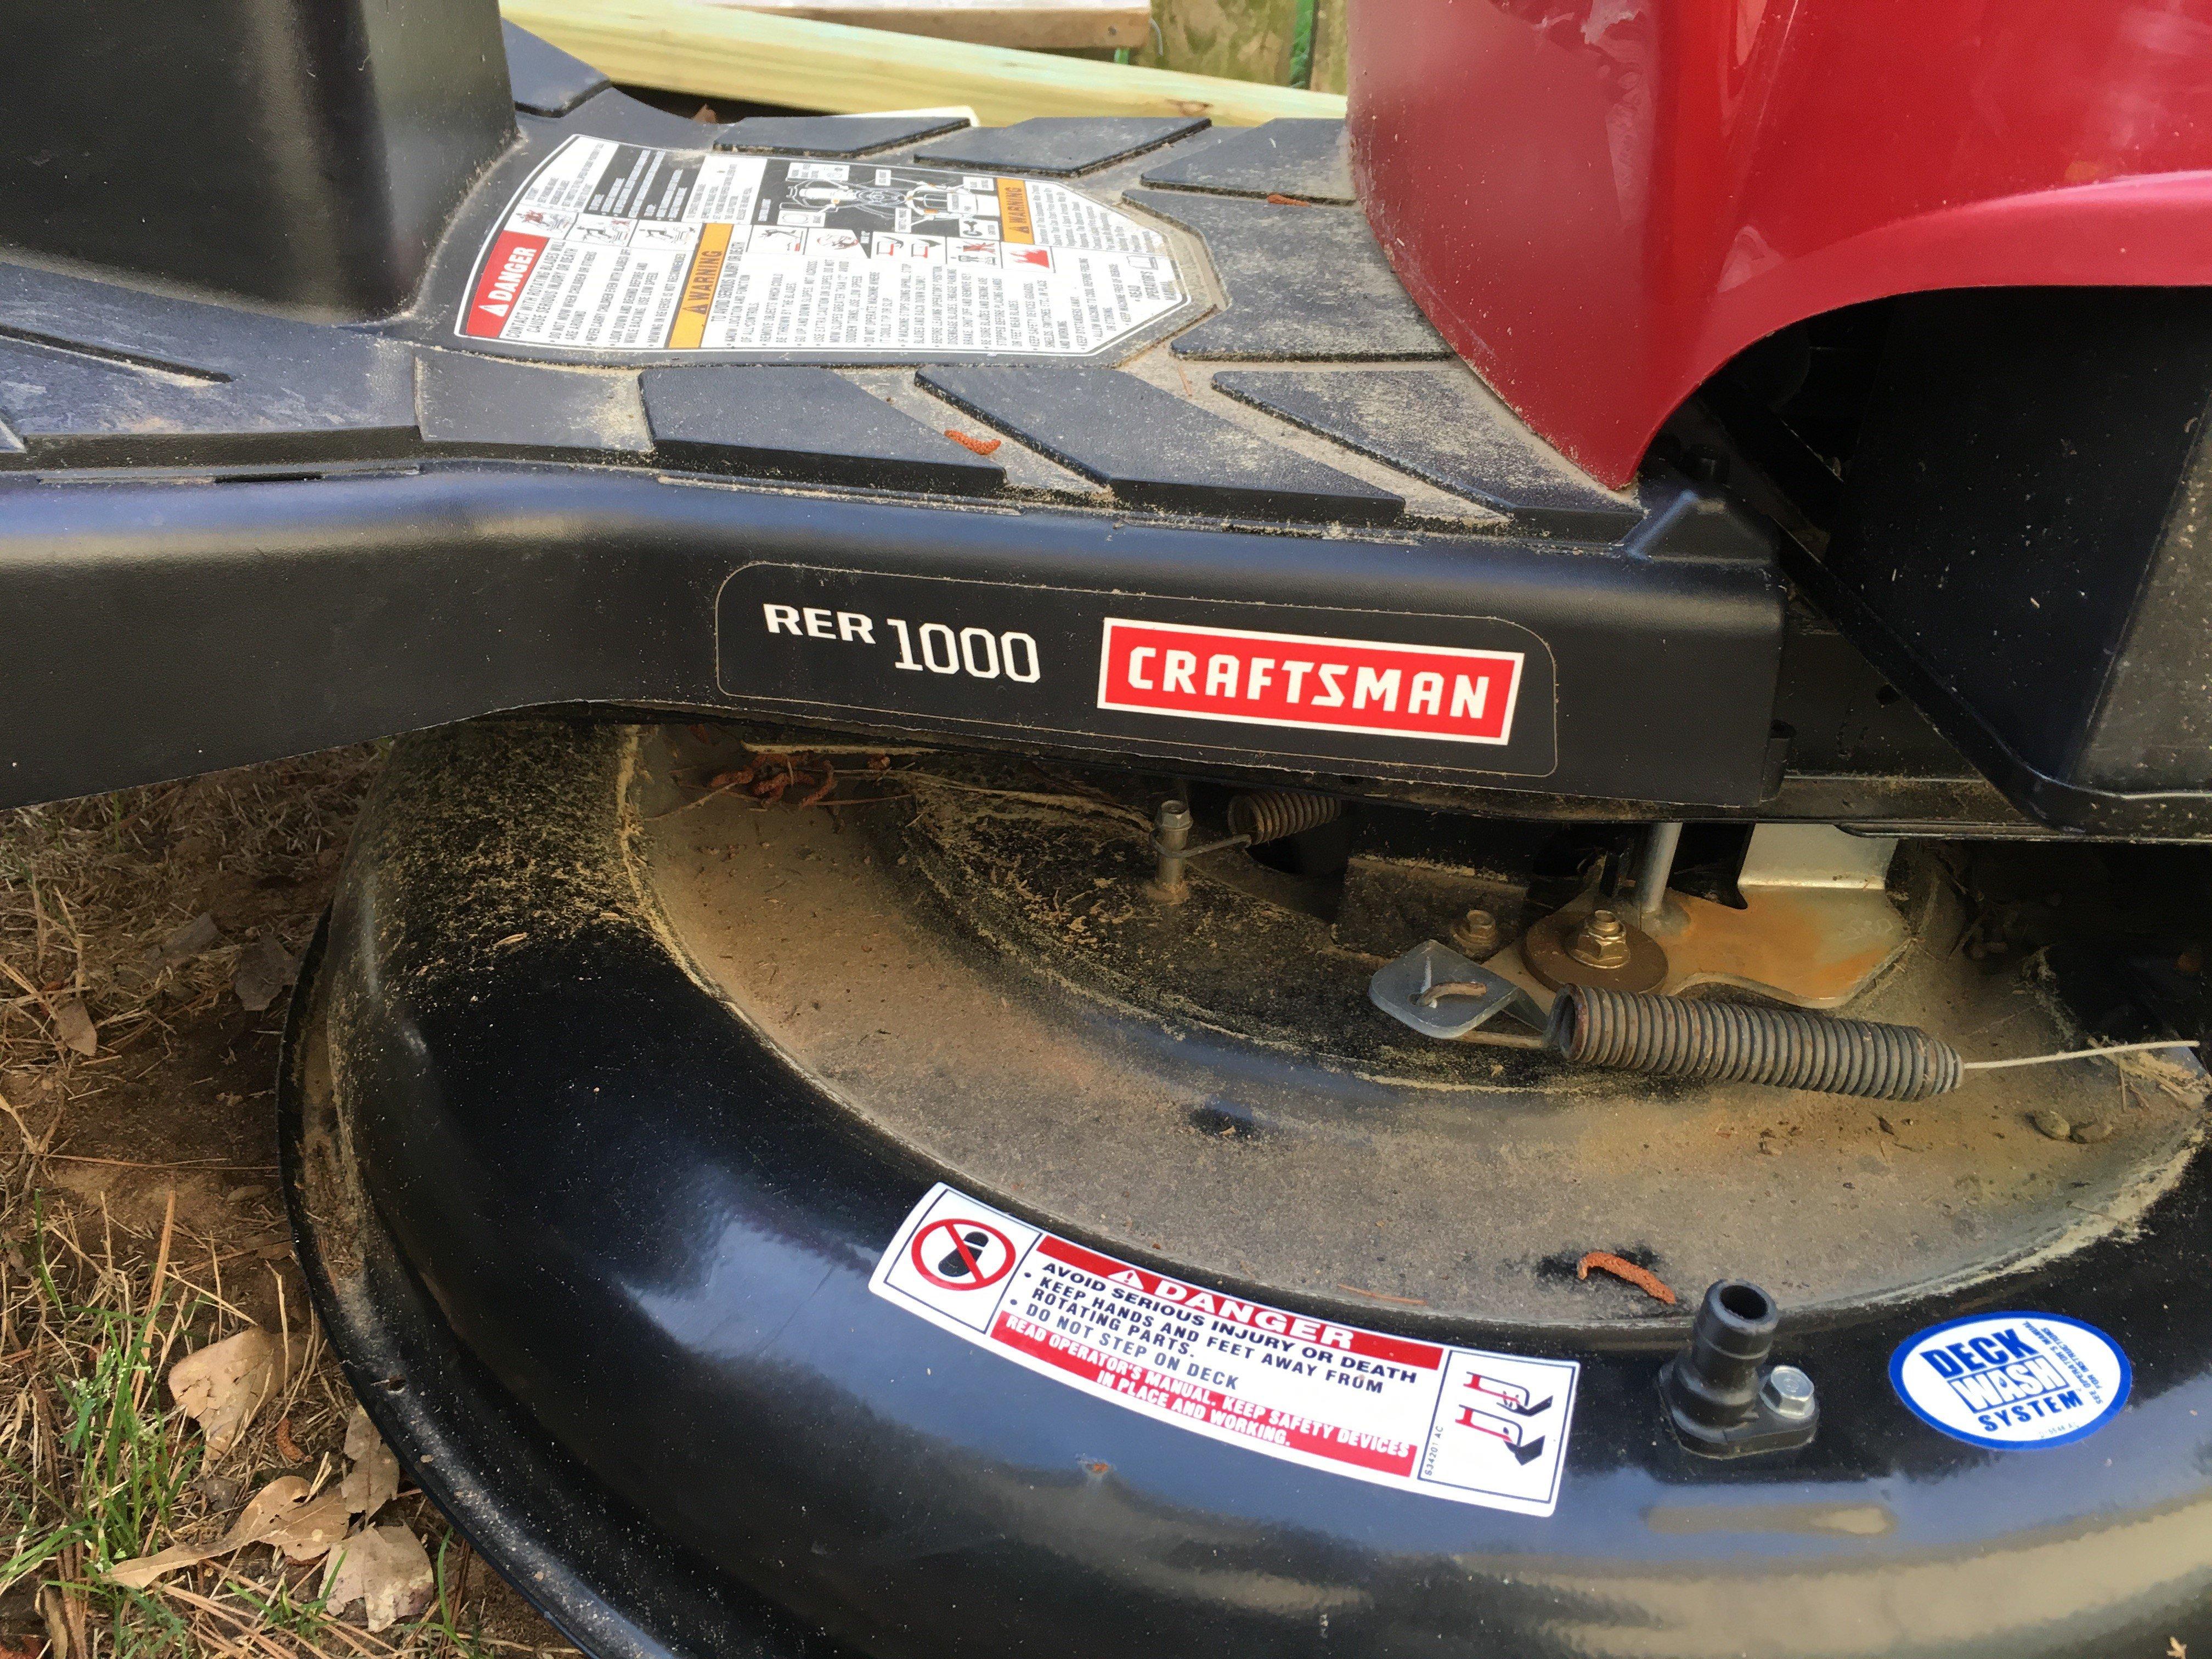 Craftsman Riding Mower | Arkansas Hunting - Your Arkansas